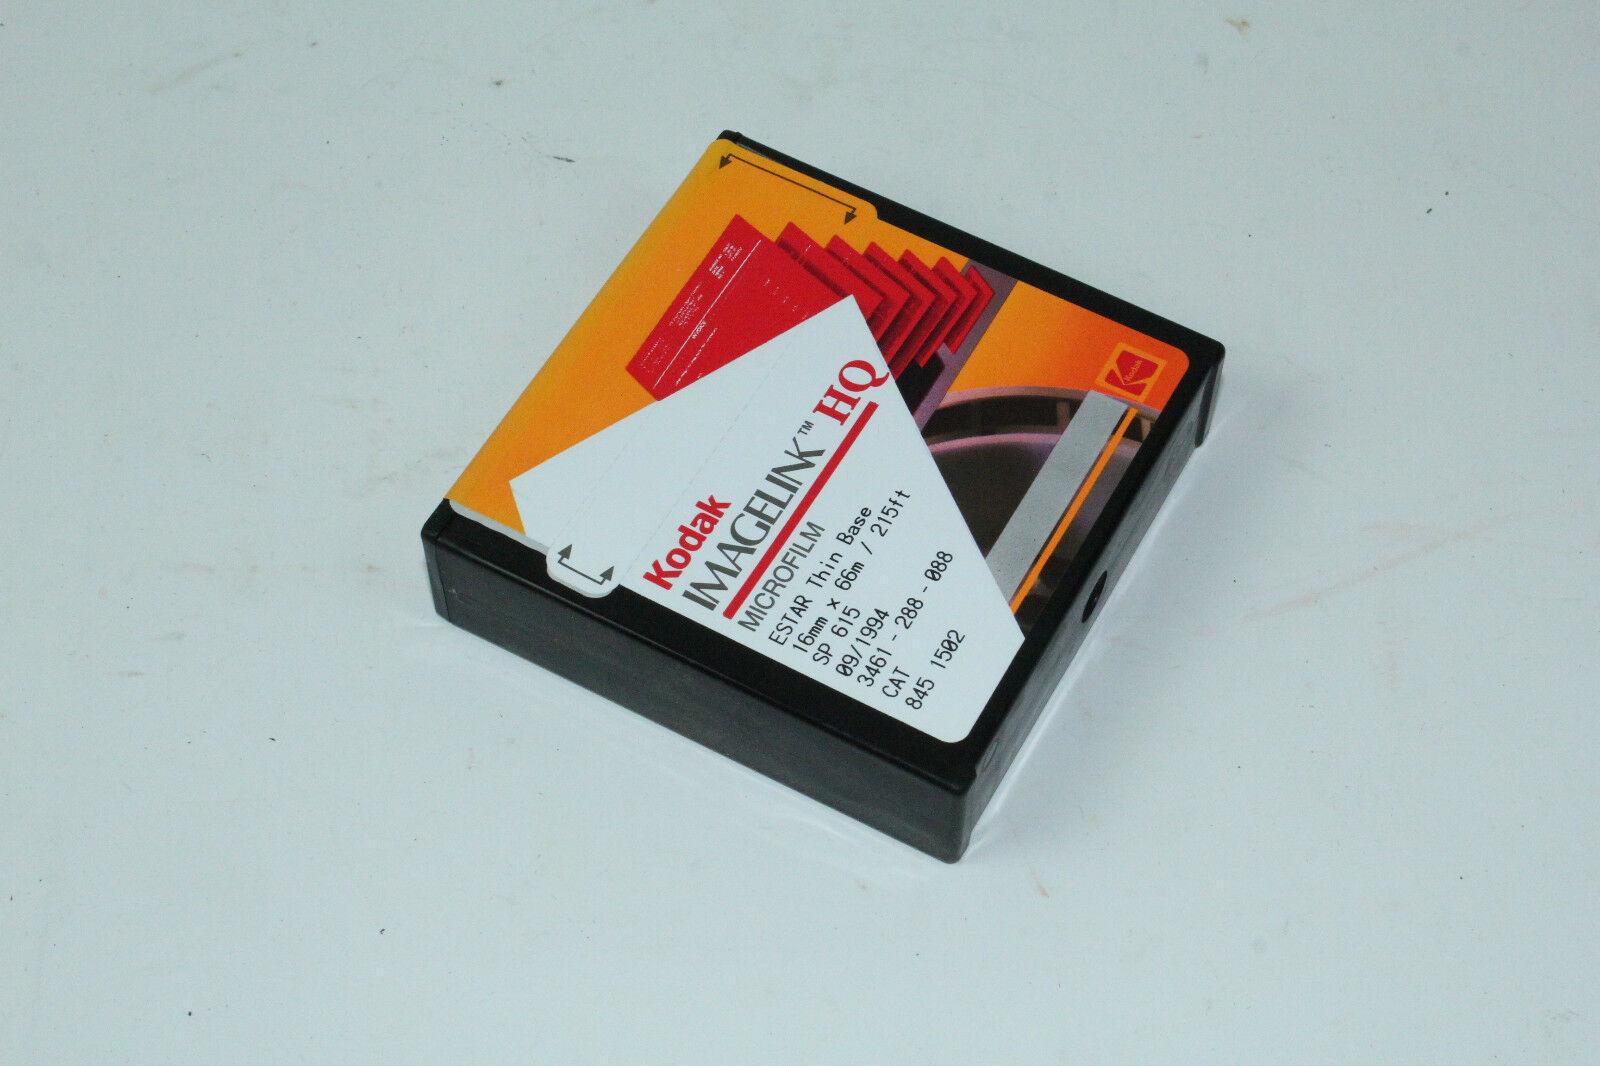 Kodak Фиша негативная Imagelink HQ Microfilm 1461